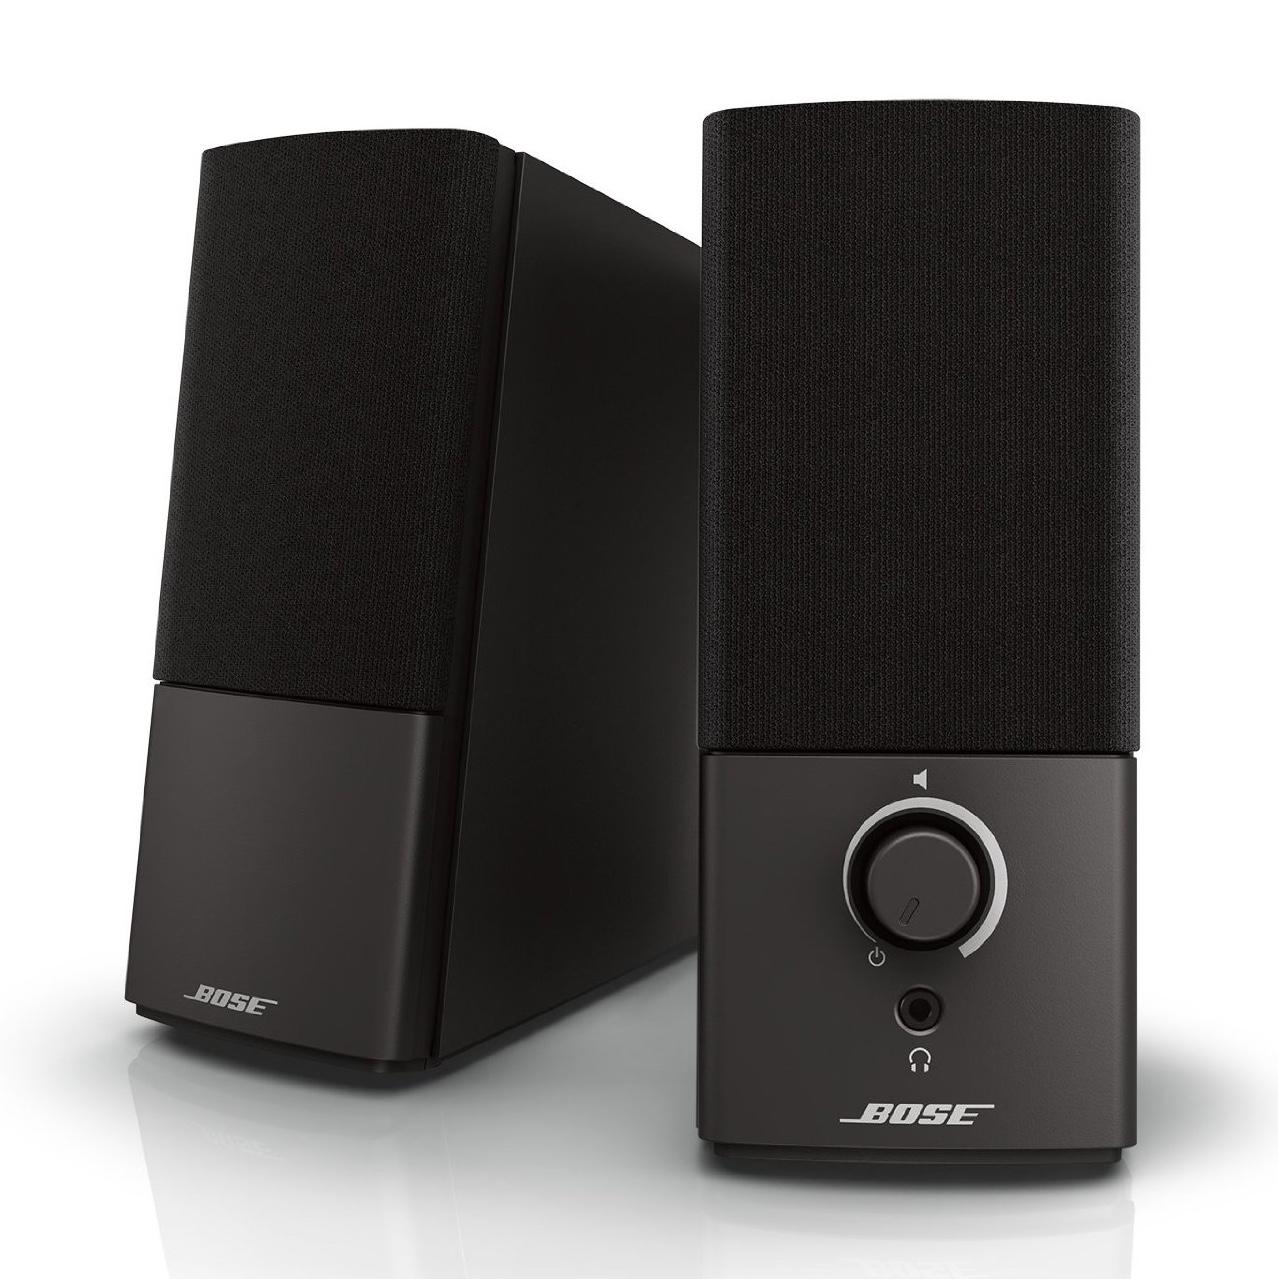 Bose Car Audio Speakers >> 15 Best Desktop Computer Speakers in 2017 - Reviews of PC Speakers for Computers